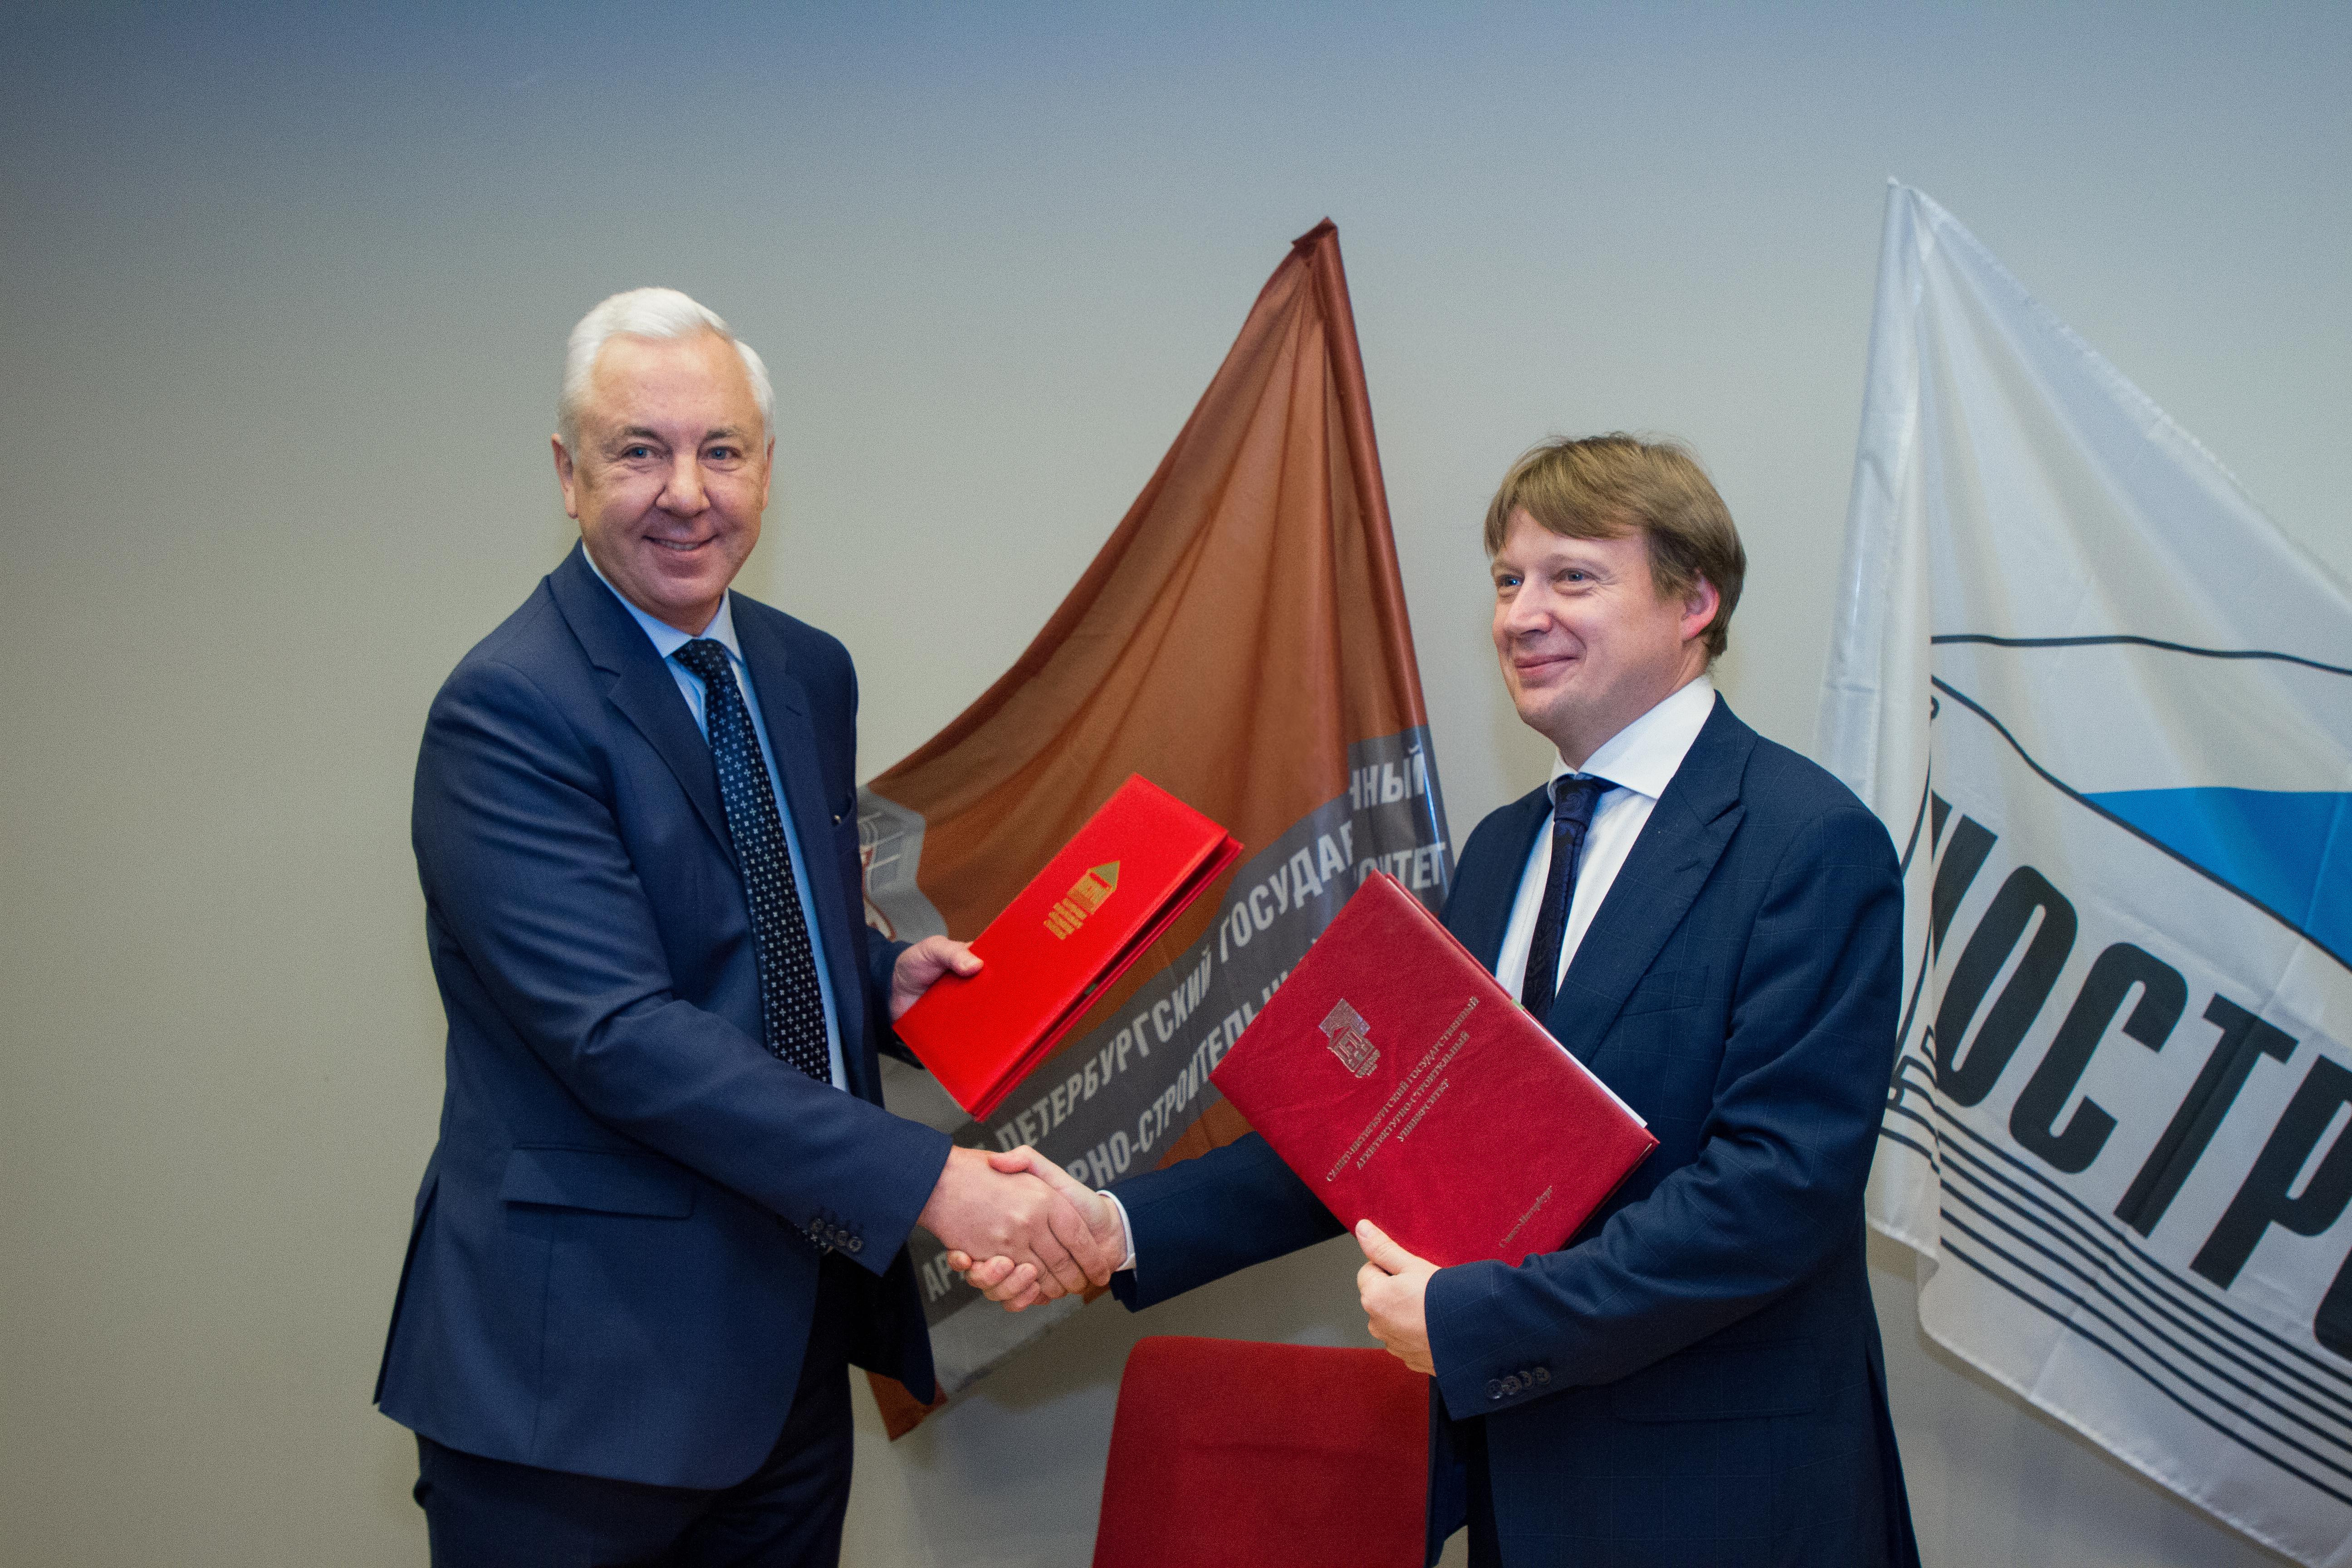 СПбГАСУ и НОСТРОЙ подписали Соглашение о сотрудничестве